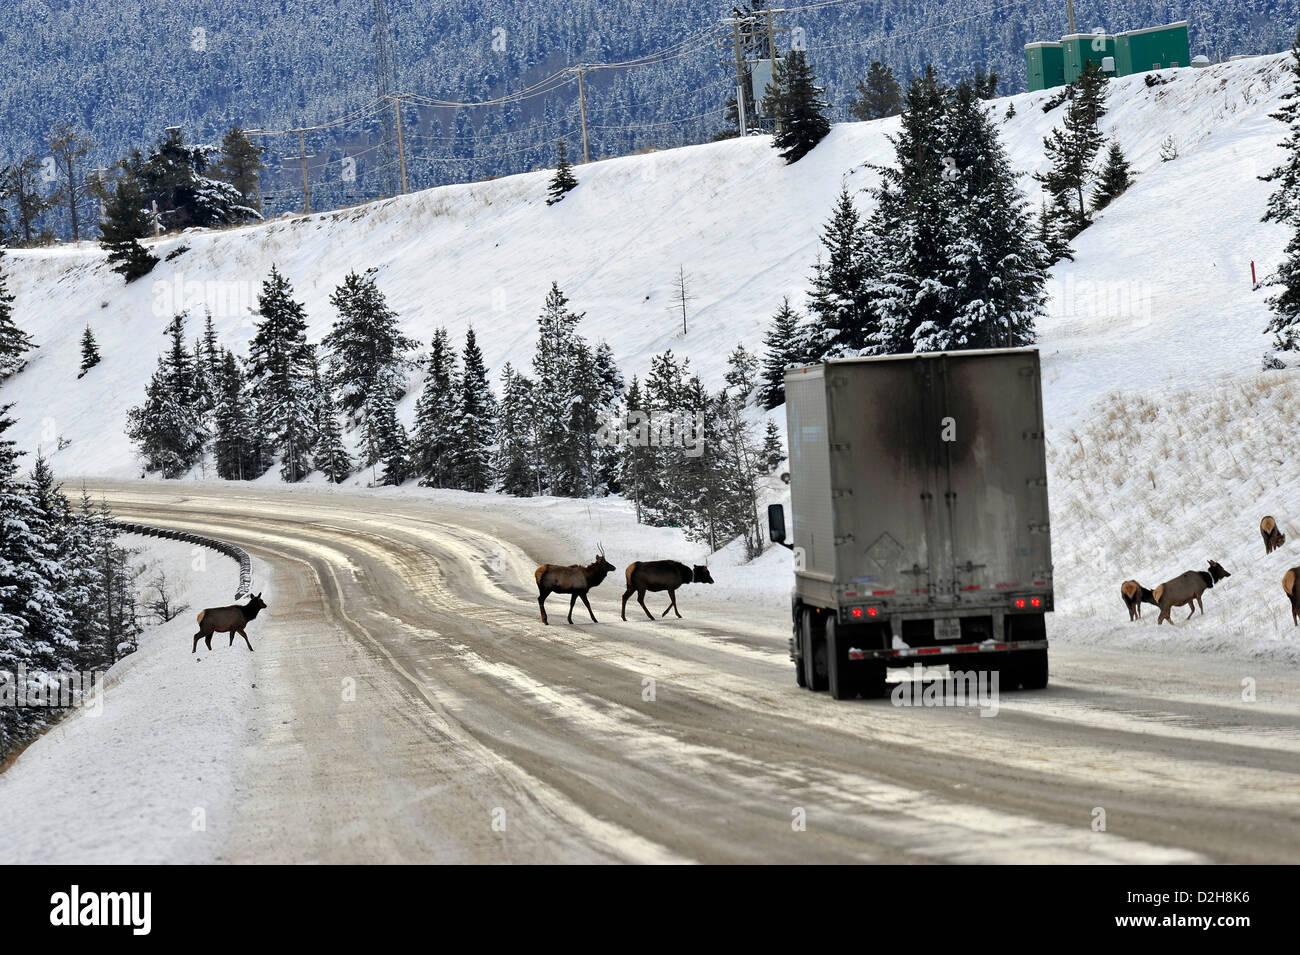 A herd of elk crossing the road. - Stock Image